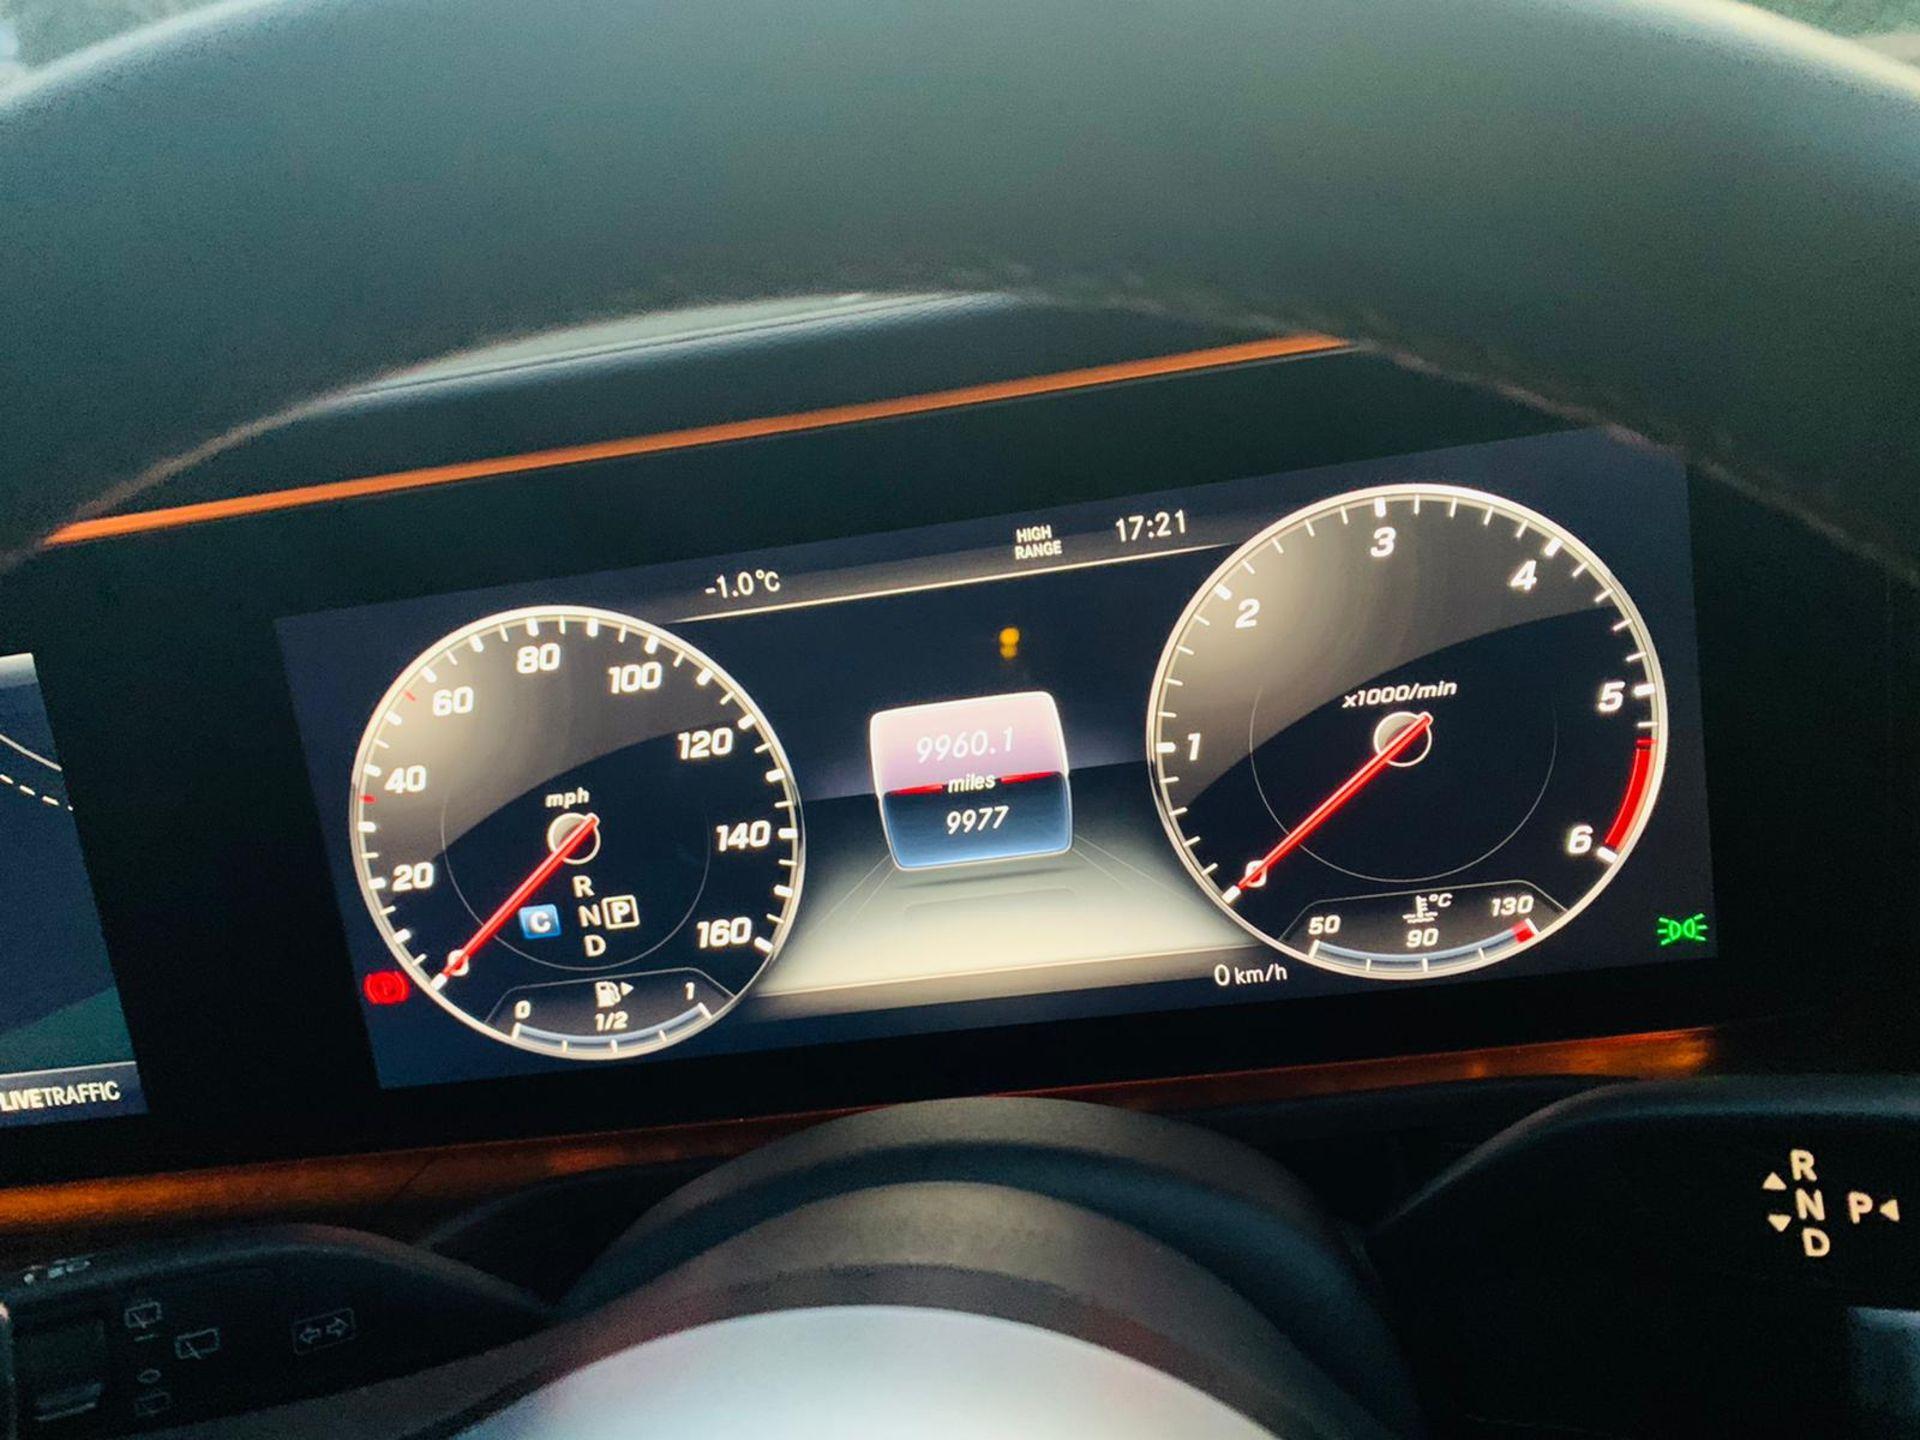 Mercedes G350d AMG LINE 9G-Tronic+ 4Matic 2020 20 Reg - 1 Owner - Only 9k Miles - HUGE SPEC - Image 41 of 41